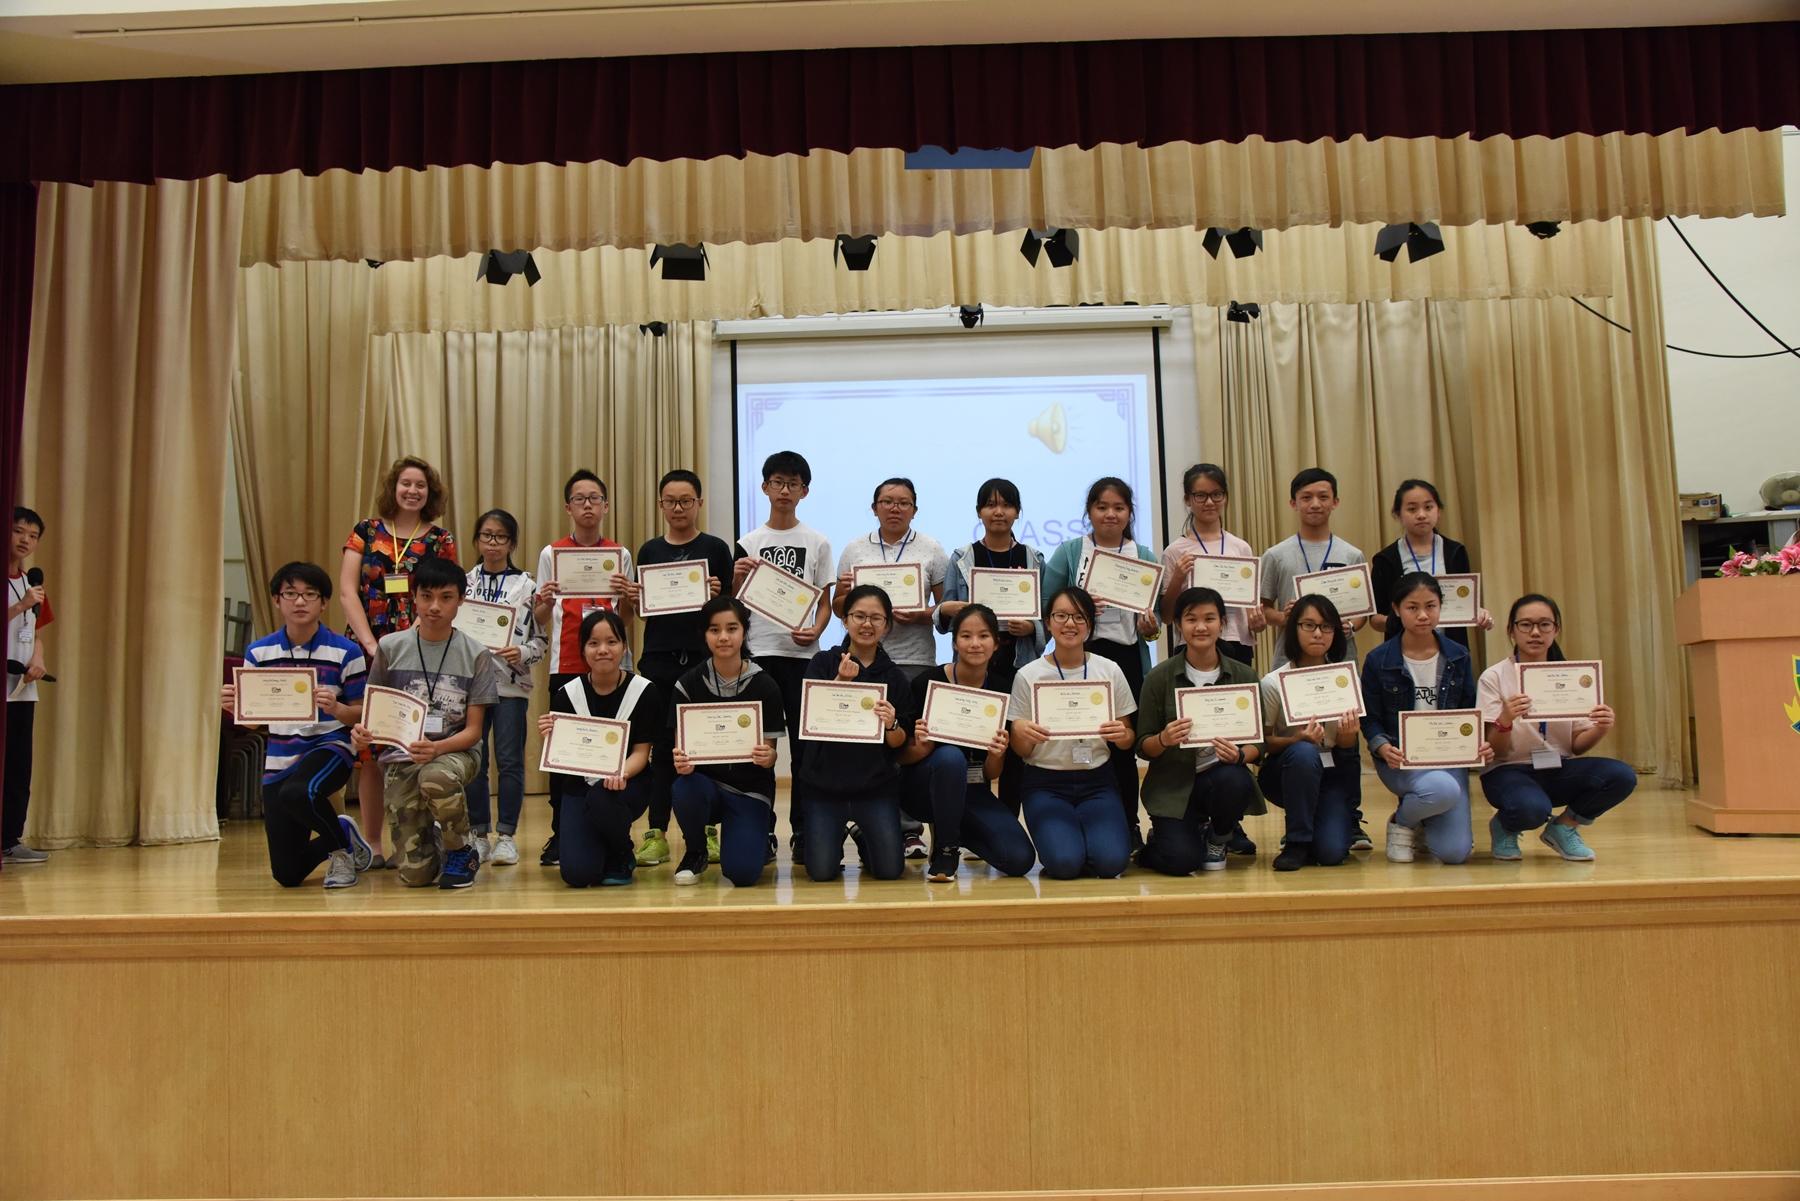 http://www.npc.edu.hk/sites/default/files/dsc_0248.jpg